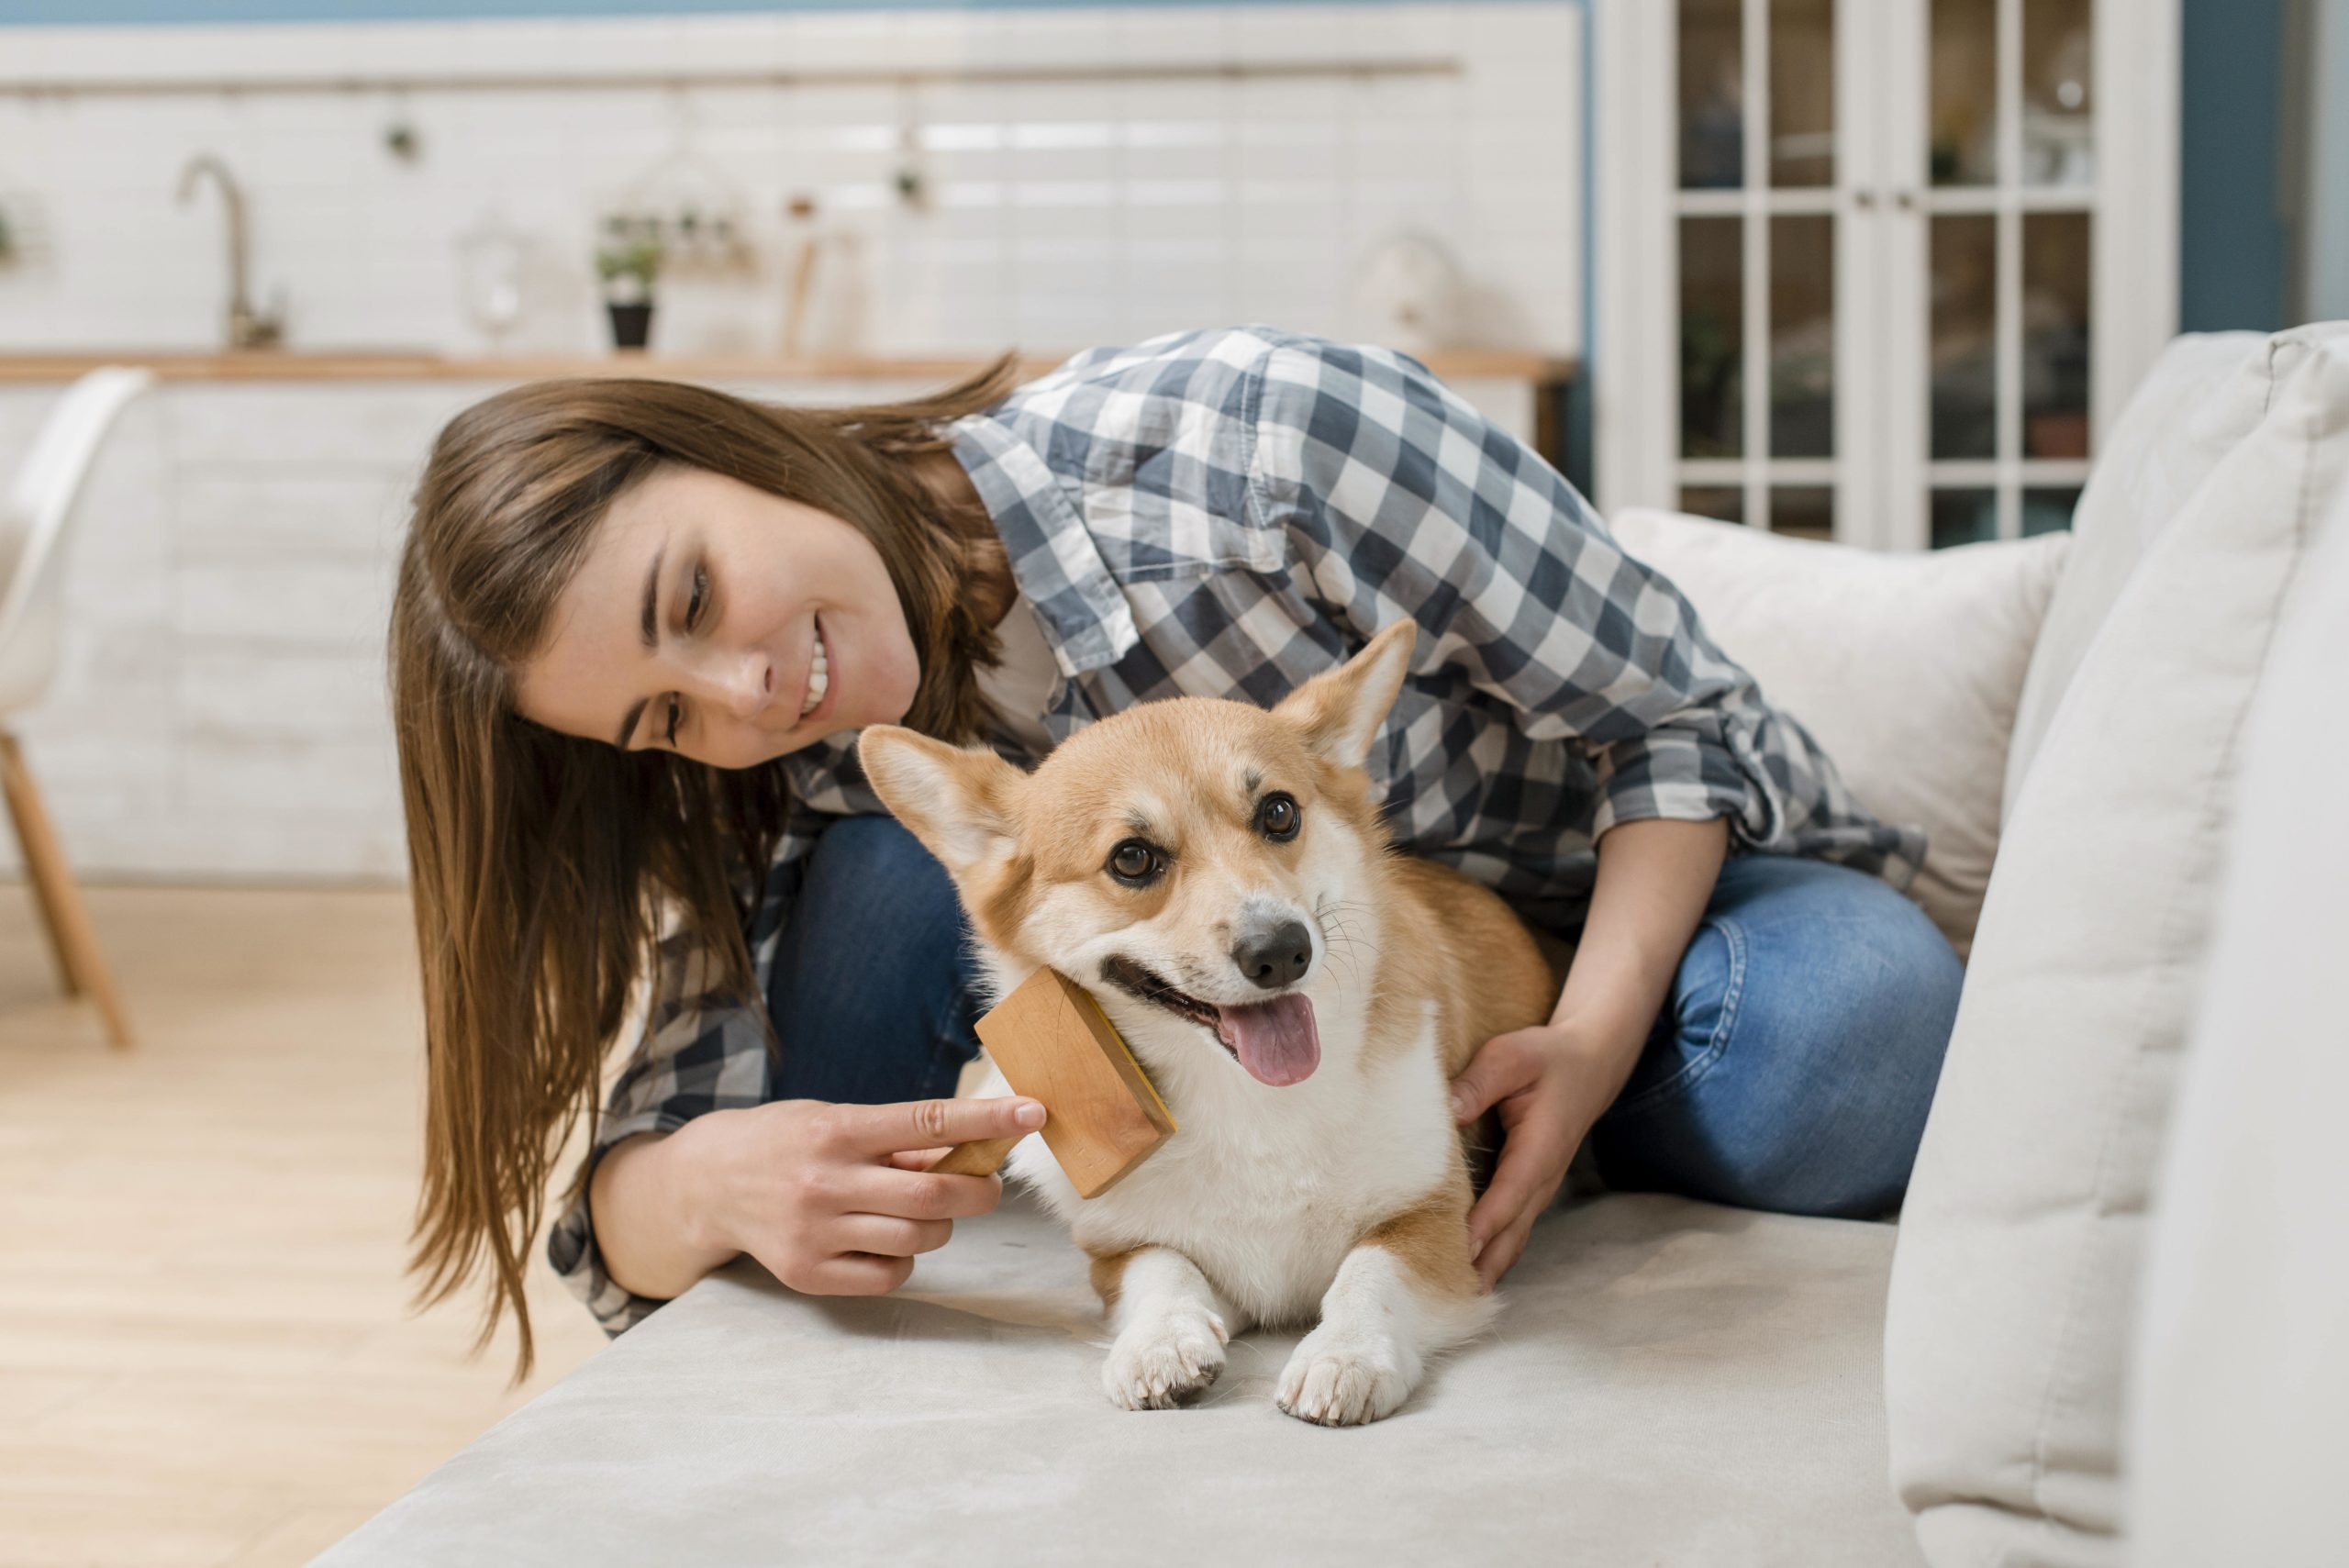 Cepillo para perros